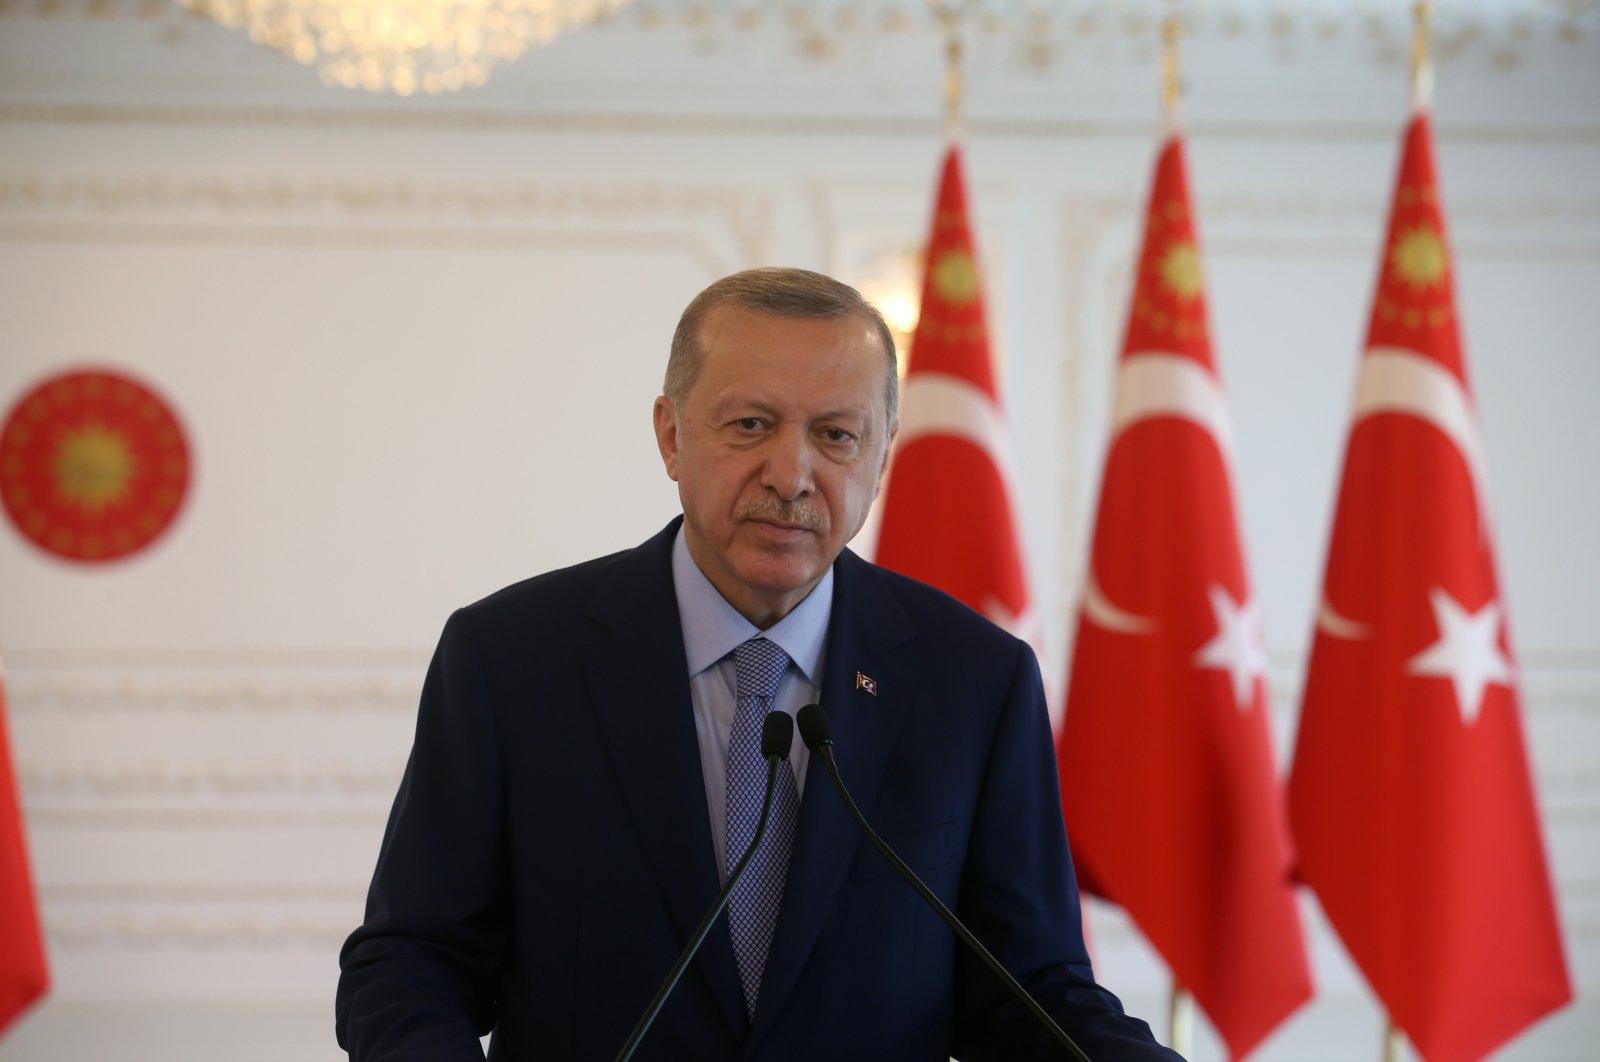 President Recep Tayyip Erdoğan at an event in Ankara, Turkey, June 22, 2020. (AA Photo)